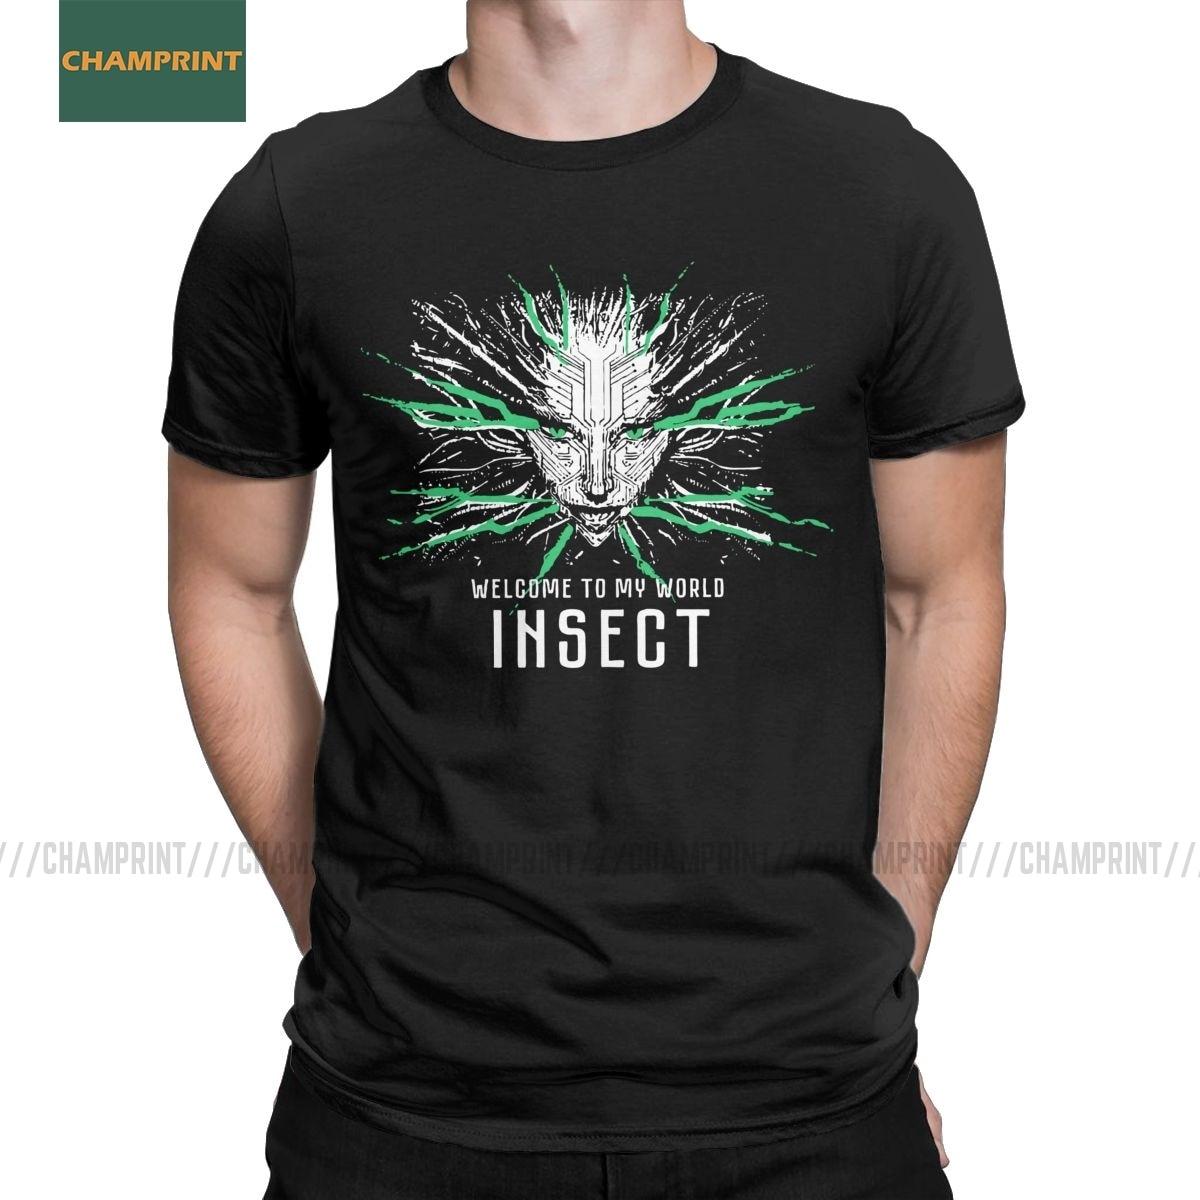 Men's Shodan System Shock T Shirt PC Game Rpg Hacker Citadel 100% Cotton Tops Vintage Short Sleeve Tees 4XL 5XL 6XL T-Shirt